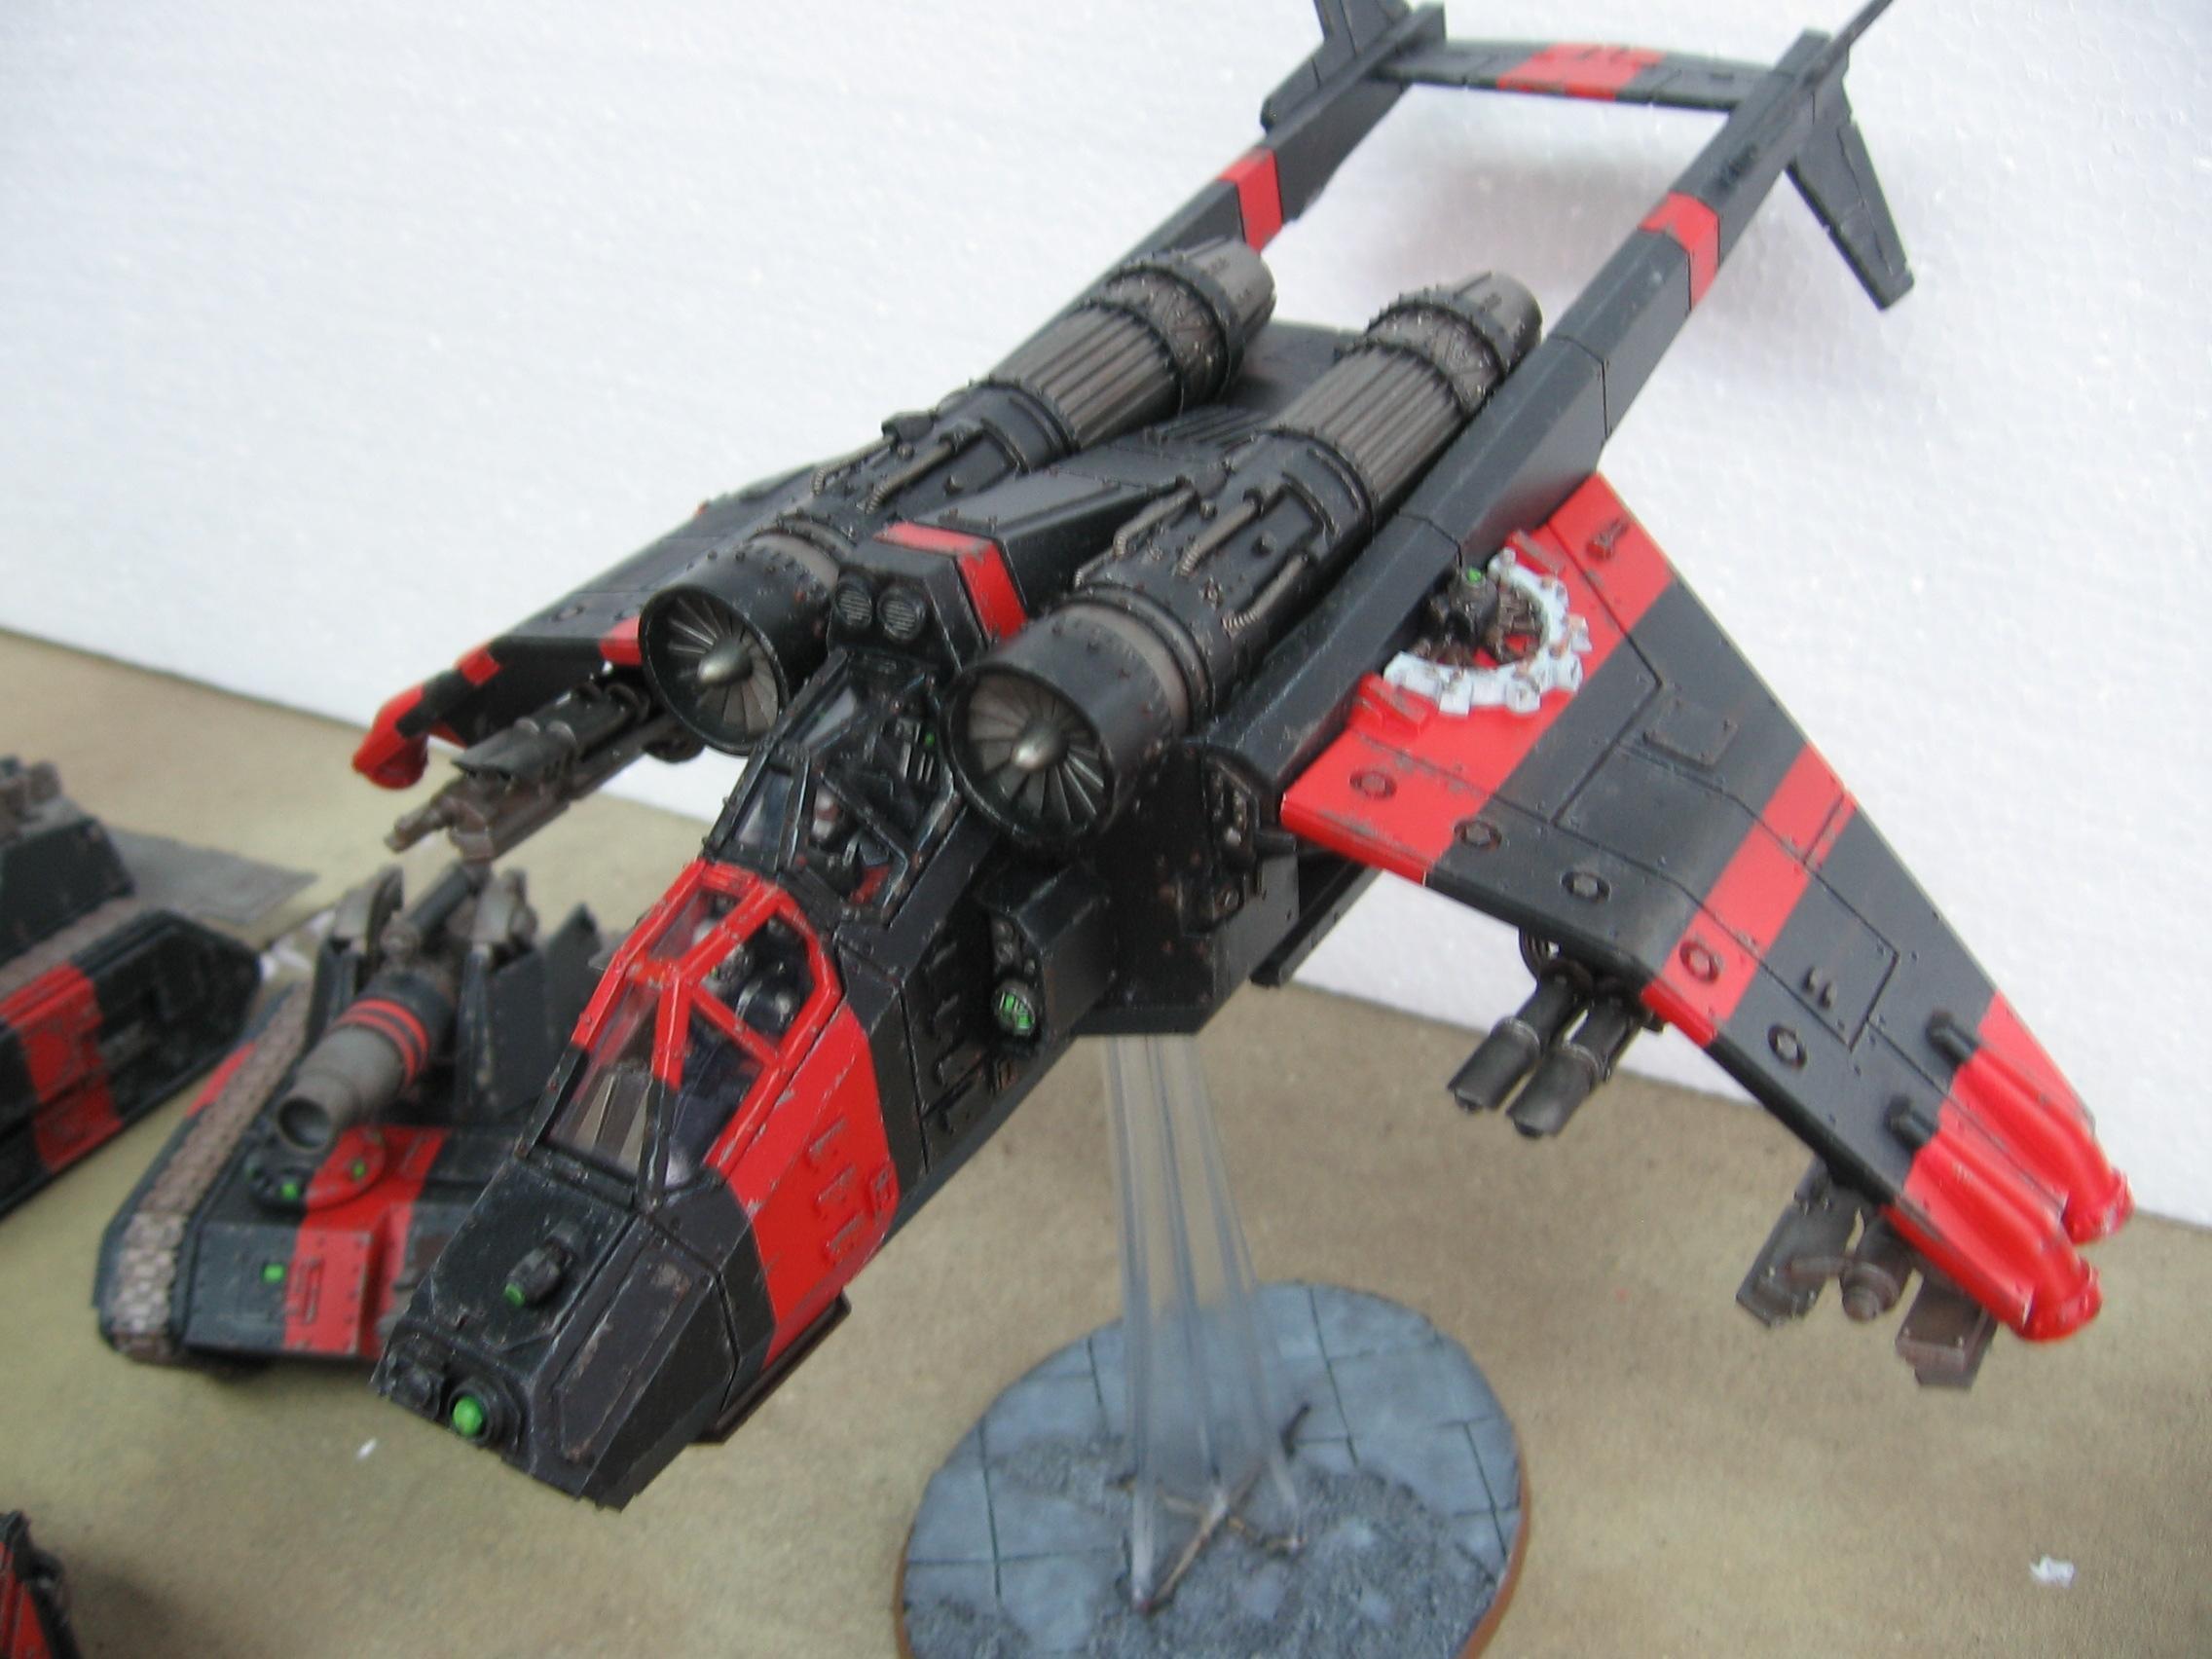 Adeptus Mechanicus, Guard, Imperial, Imperial Guard, Mechanicus, Warhammer 40,000